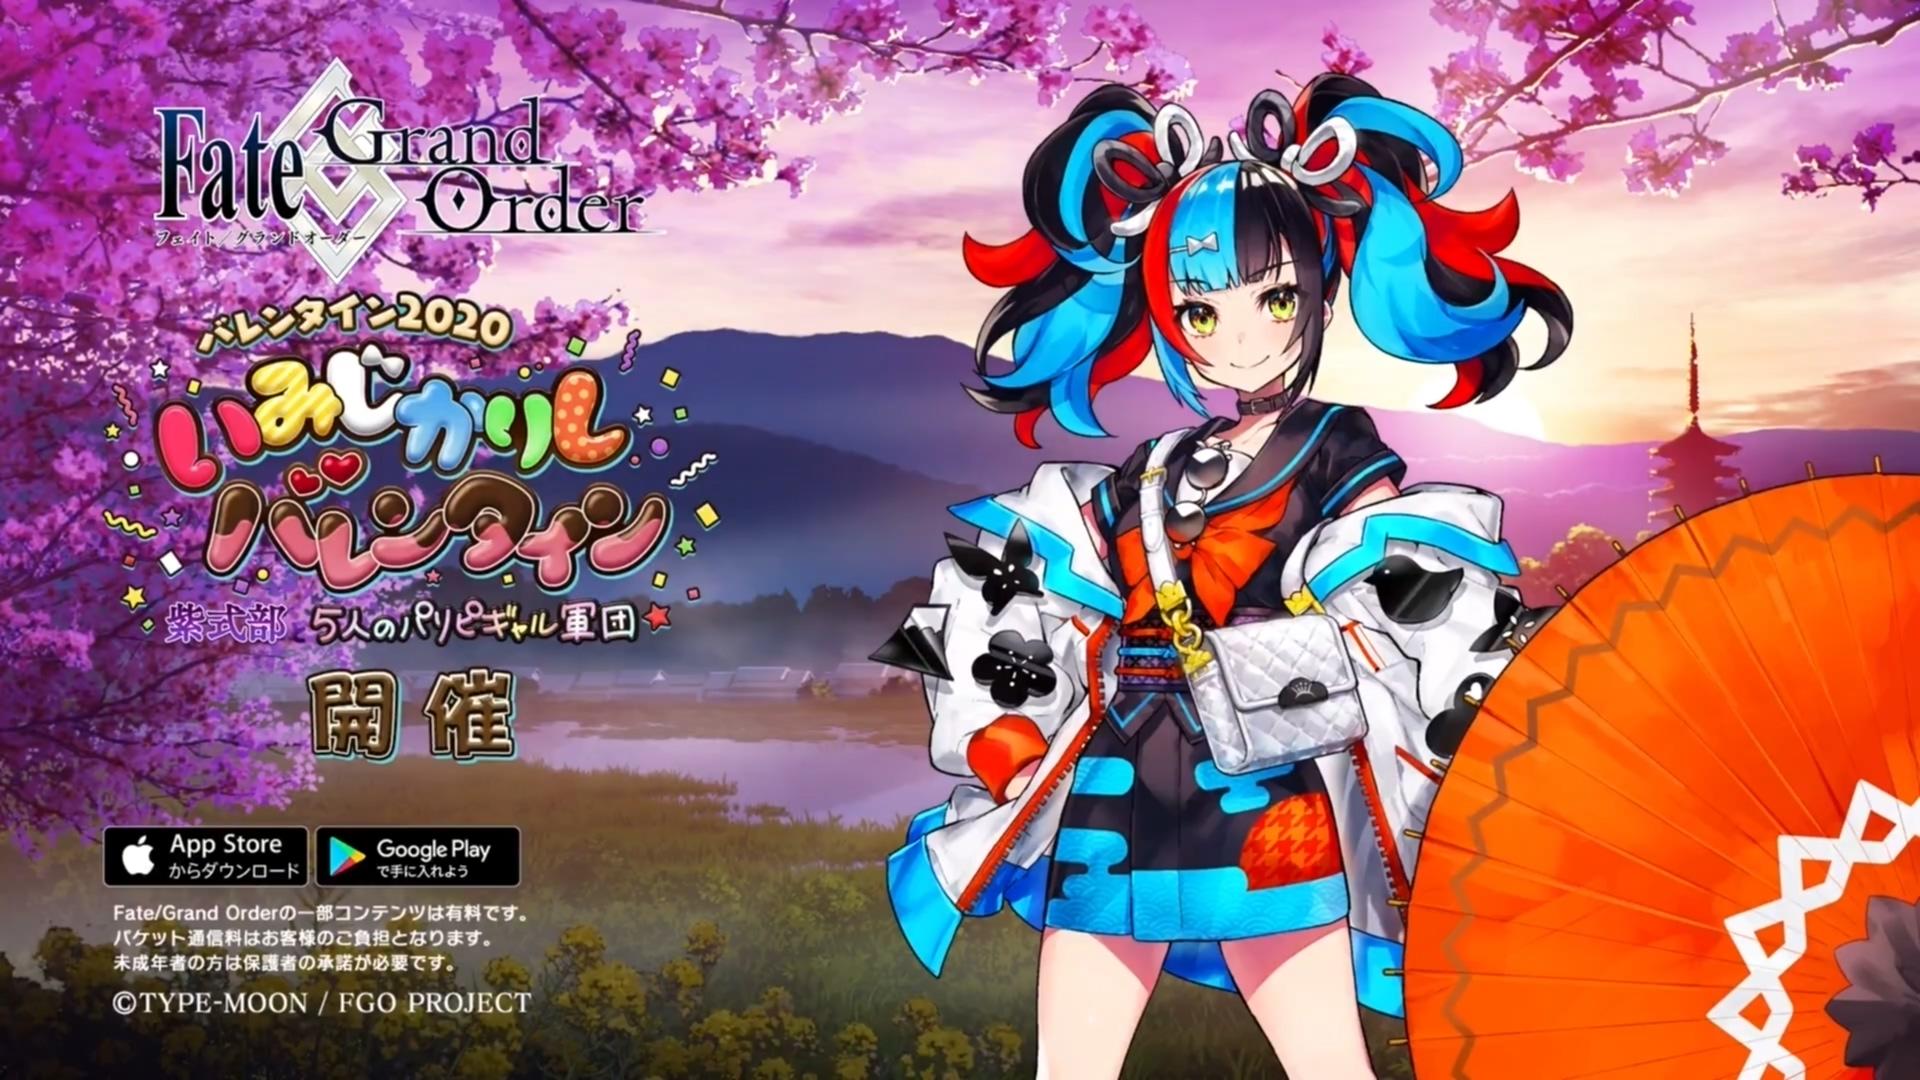 Fate Grand Order 游戏新TVCM公开! Fate Grand Order ACG资讯